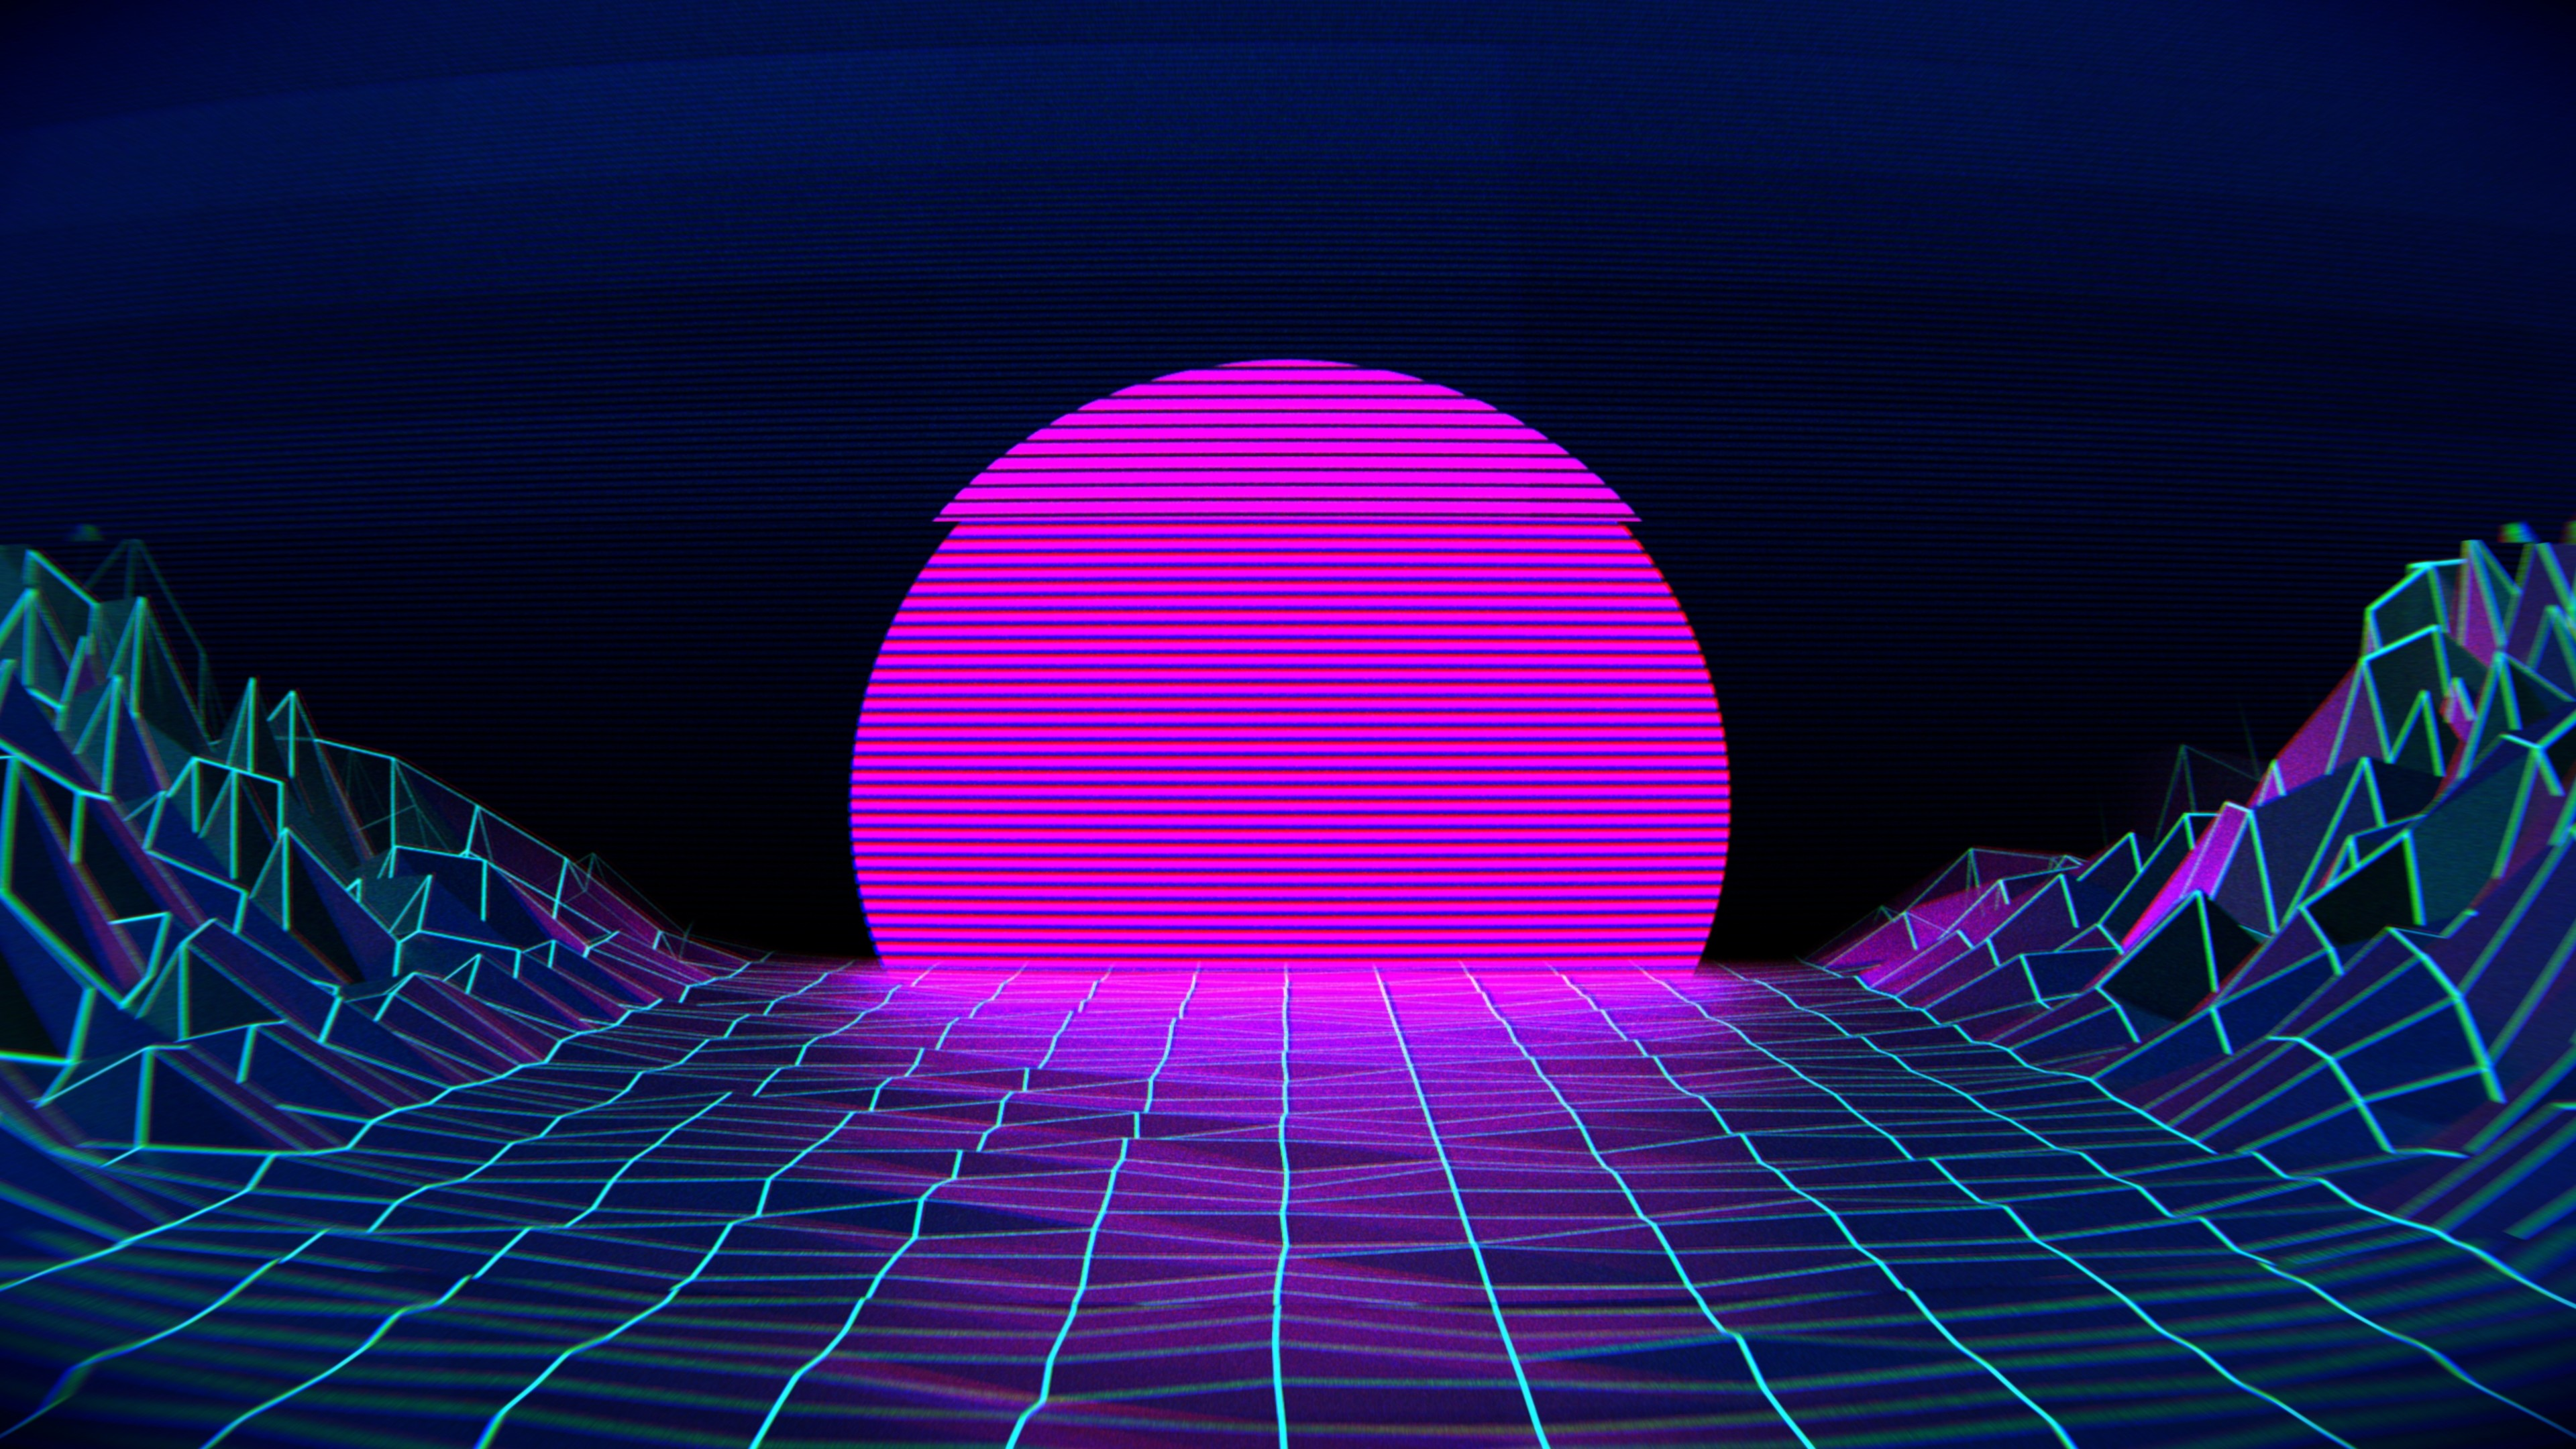 Vaporwave wallpaper download free stunning full hd for Sfondi 2560x1440